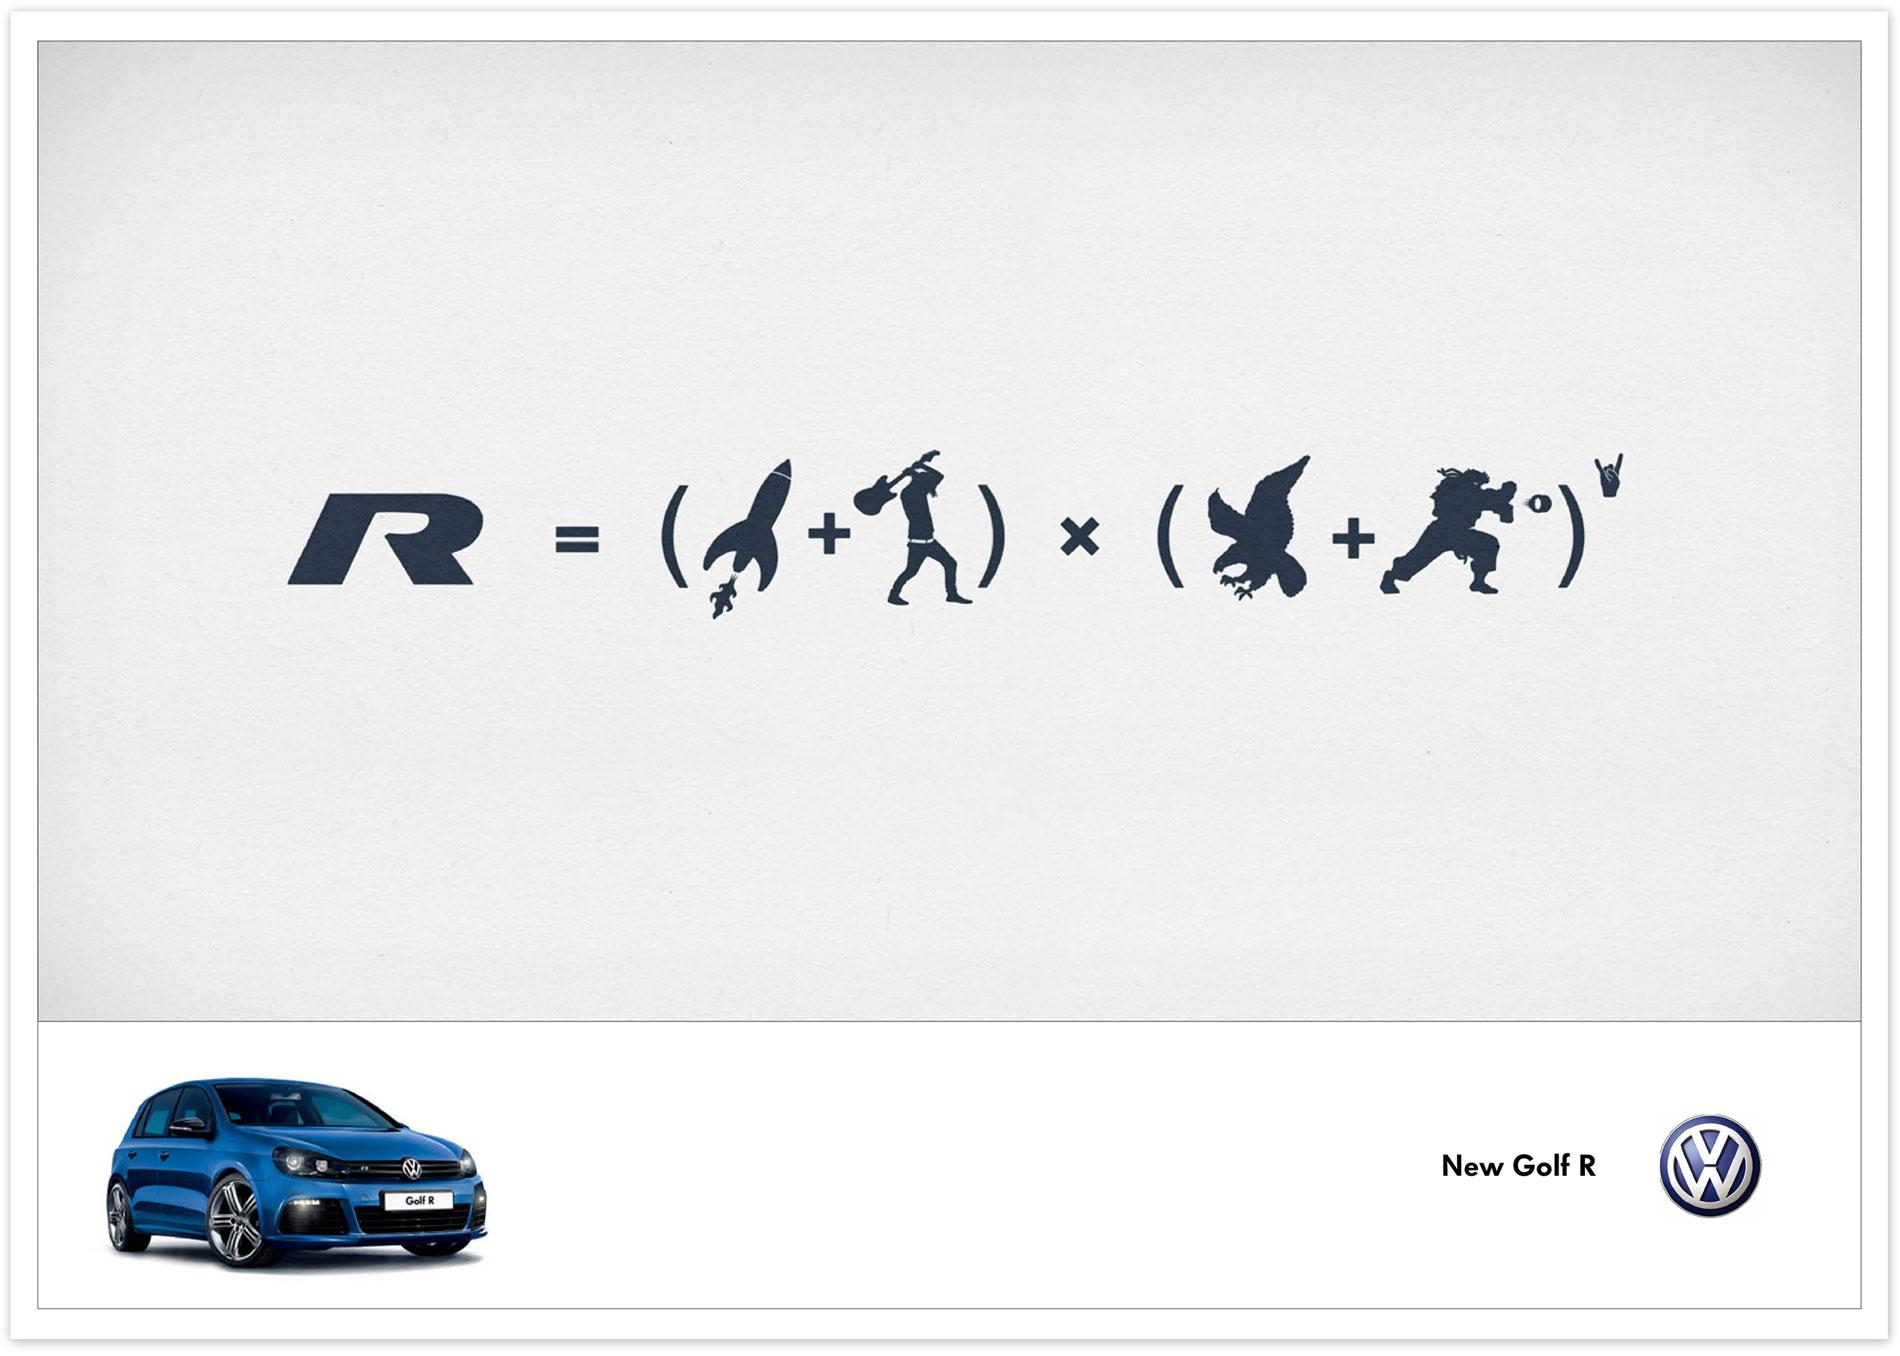 Vw-golf-R-Print-2.jpg